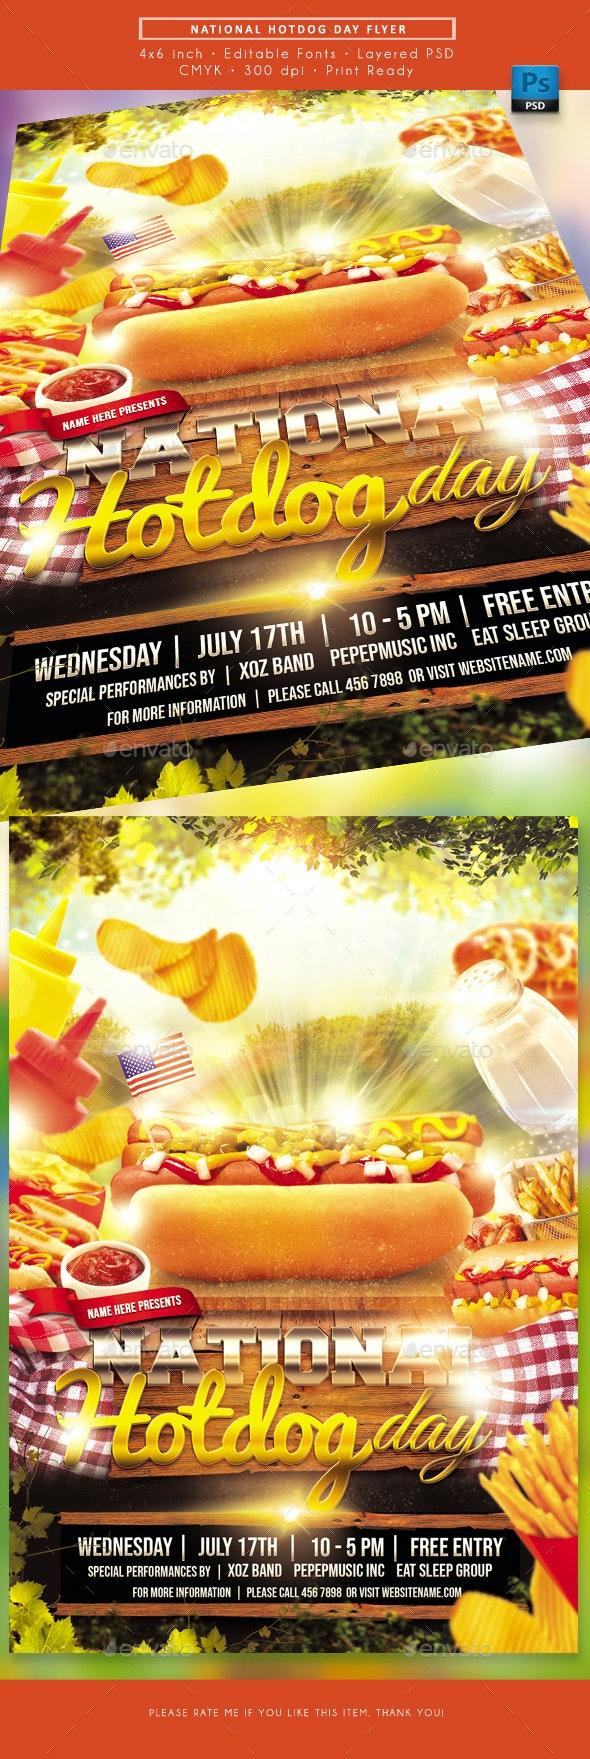 National Hotdog Day Flyer - Events Flyers